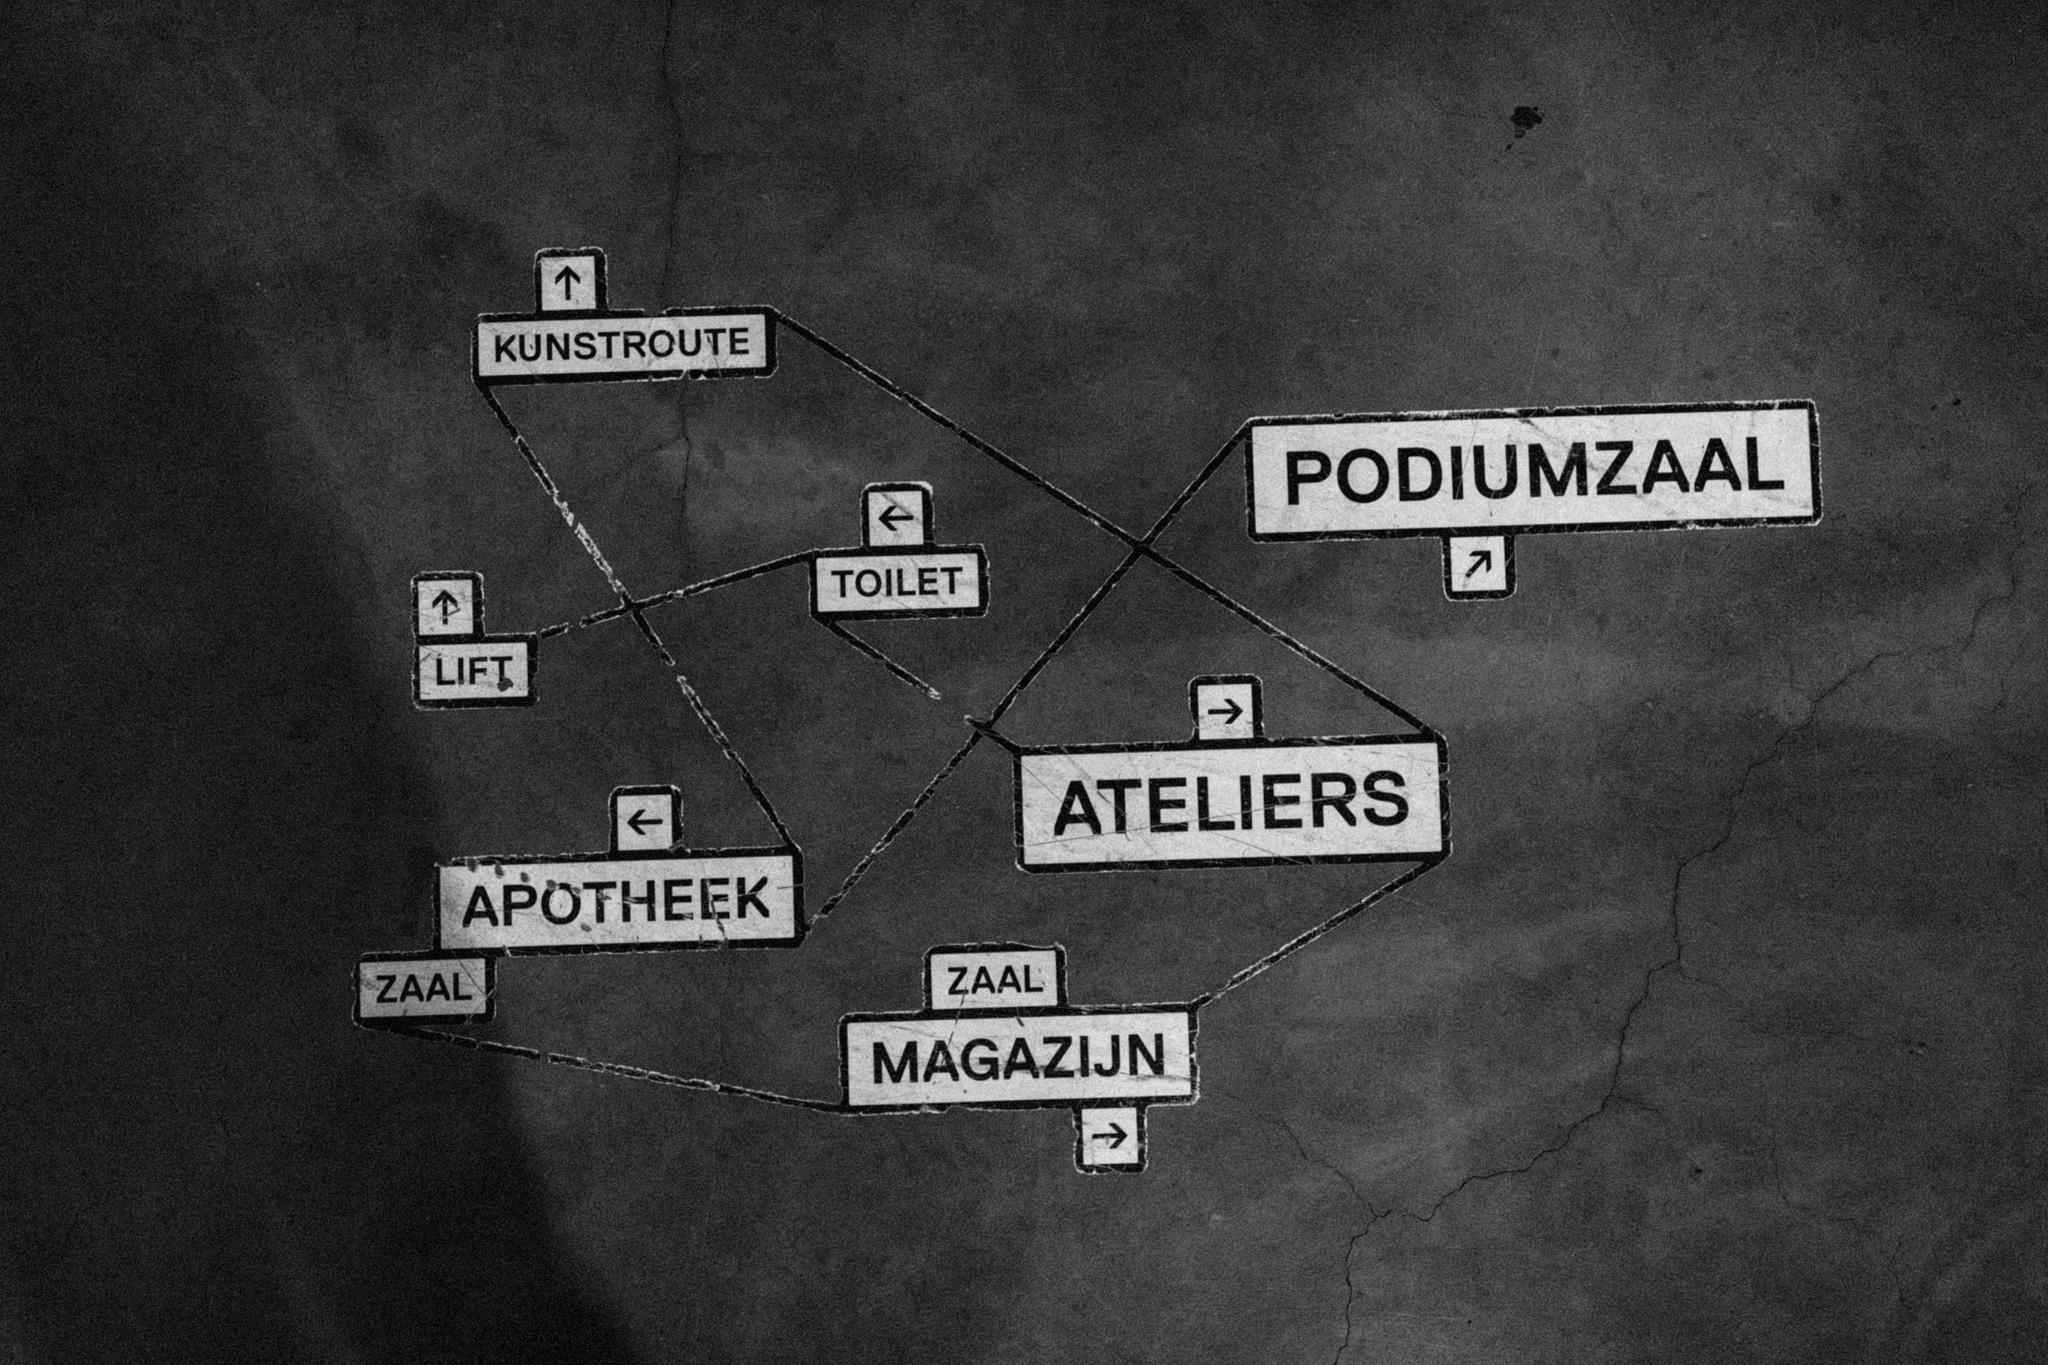 Kaart van locaties in CHV Noordkade